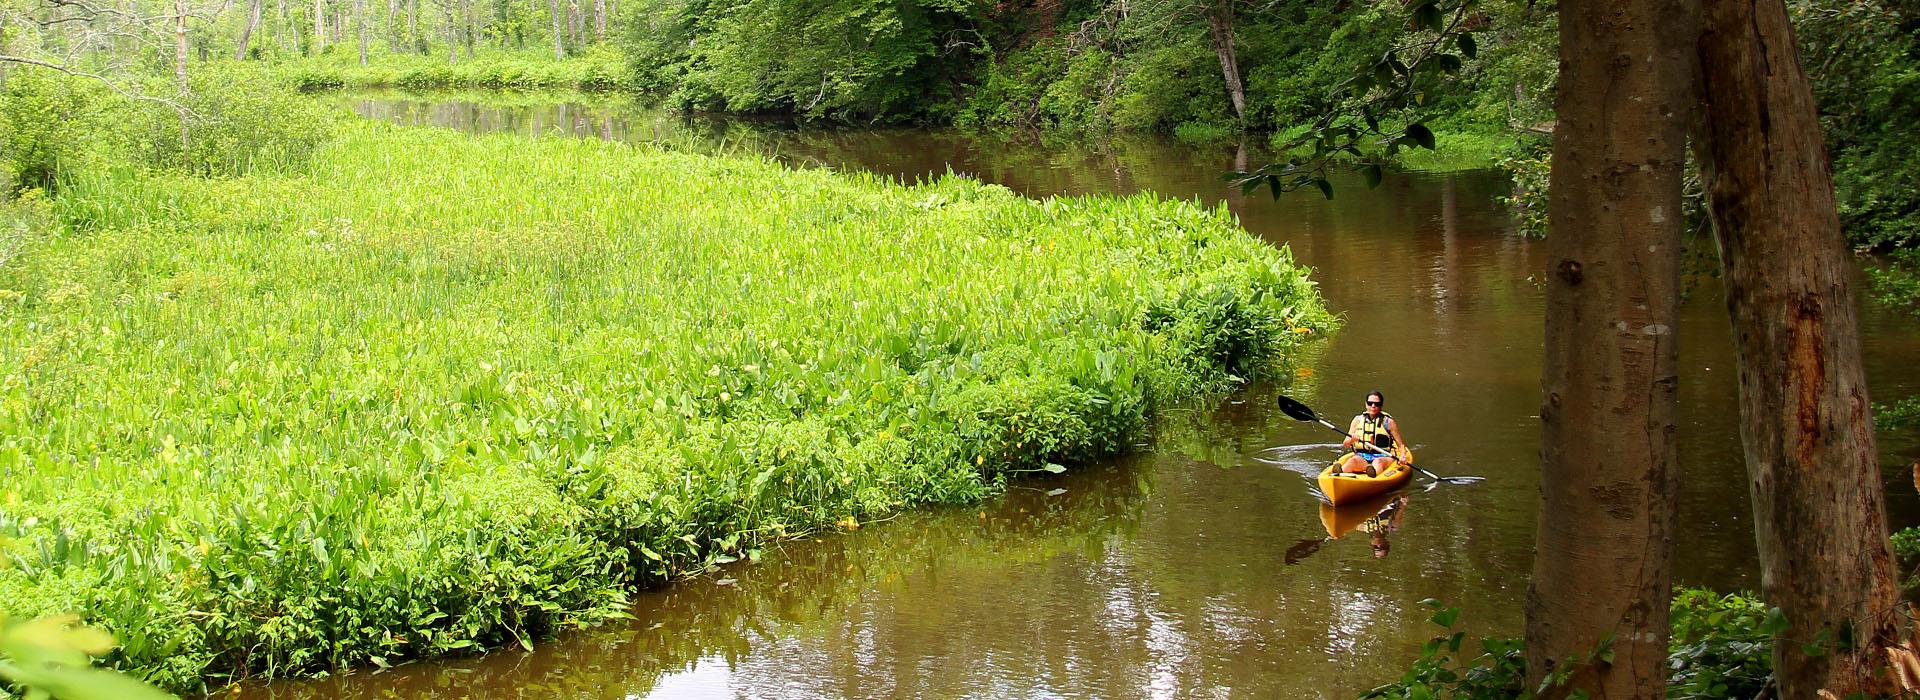 Explore the creek in a kayak.